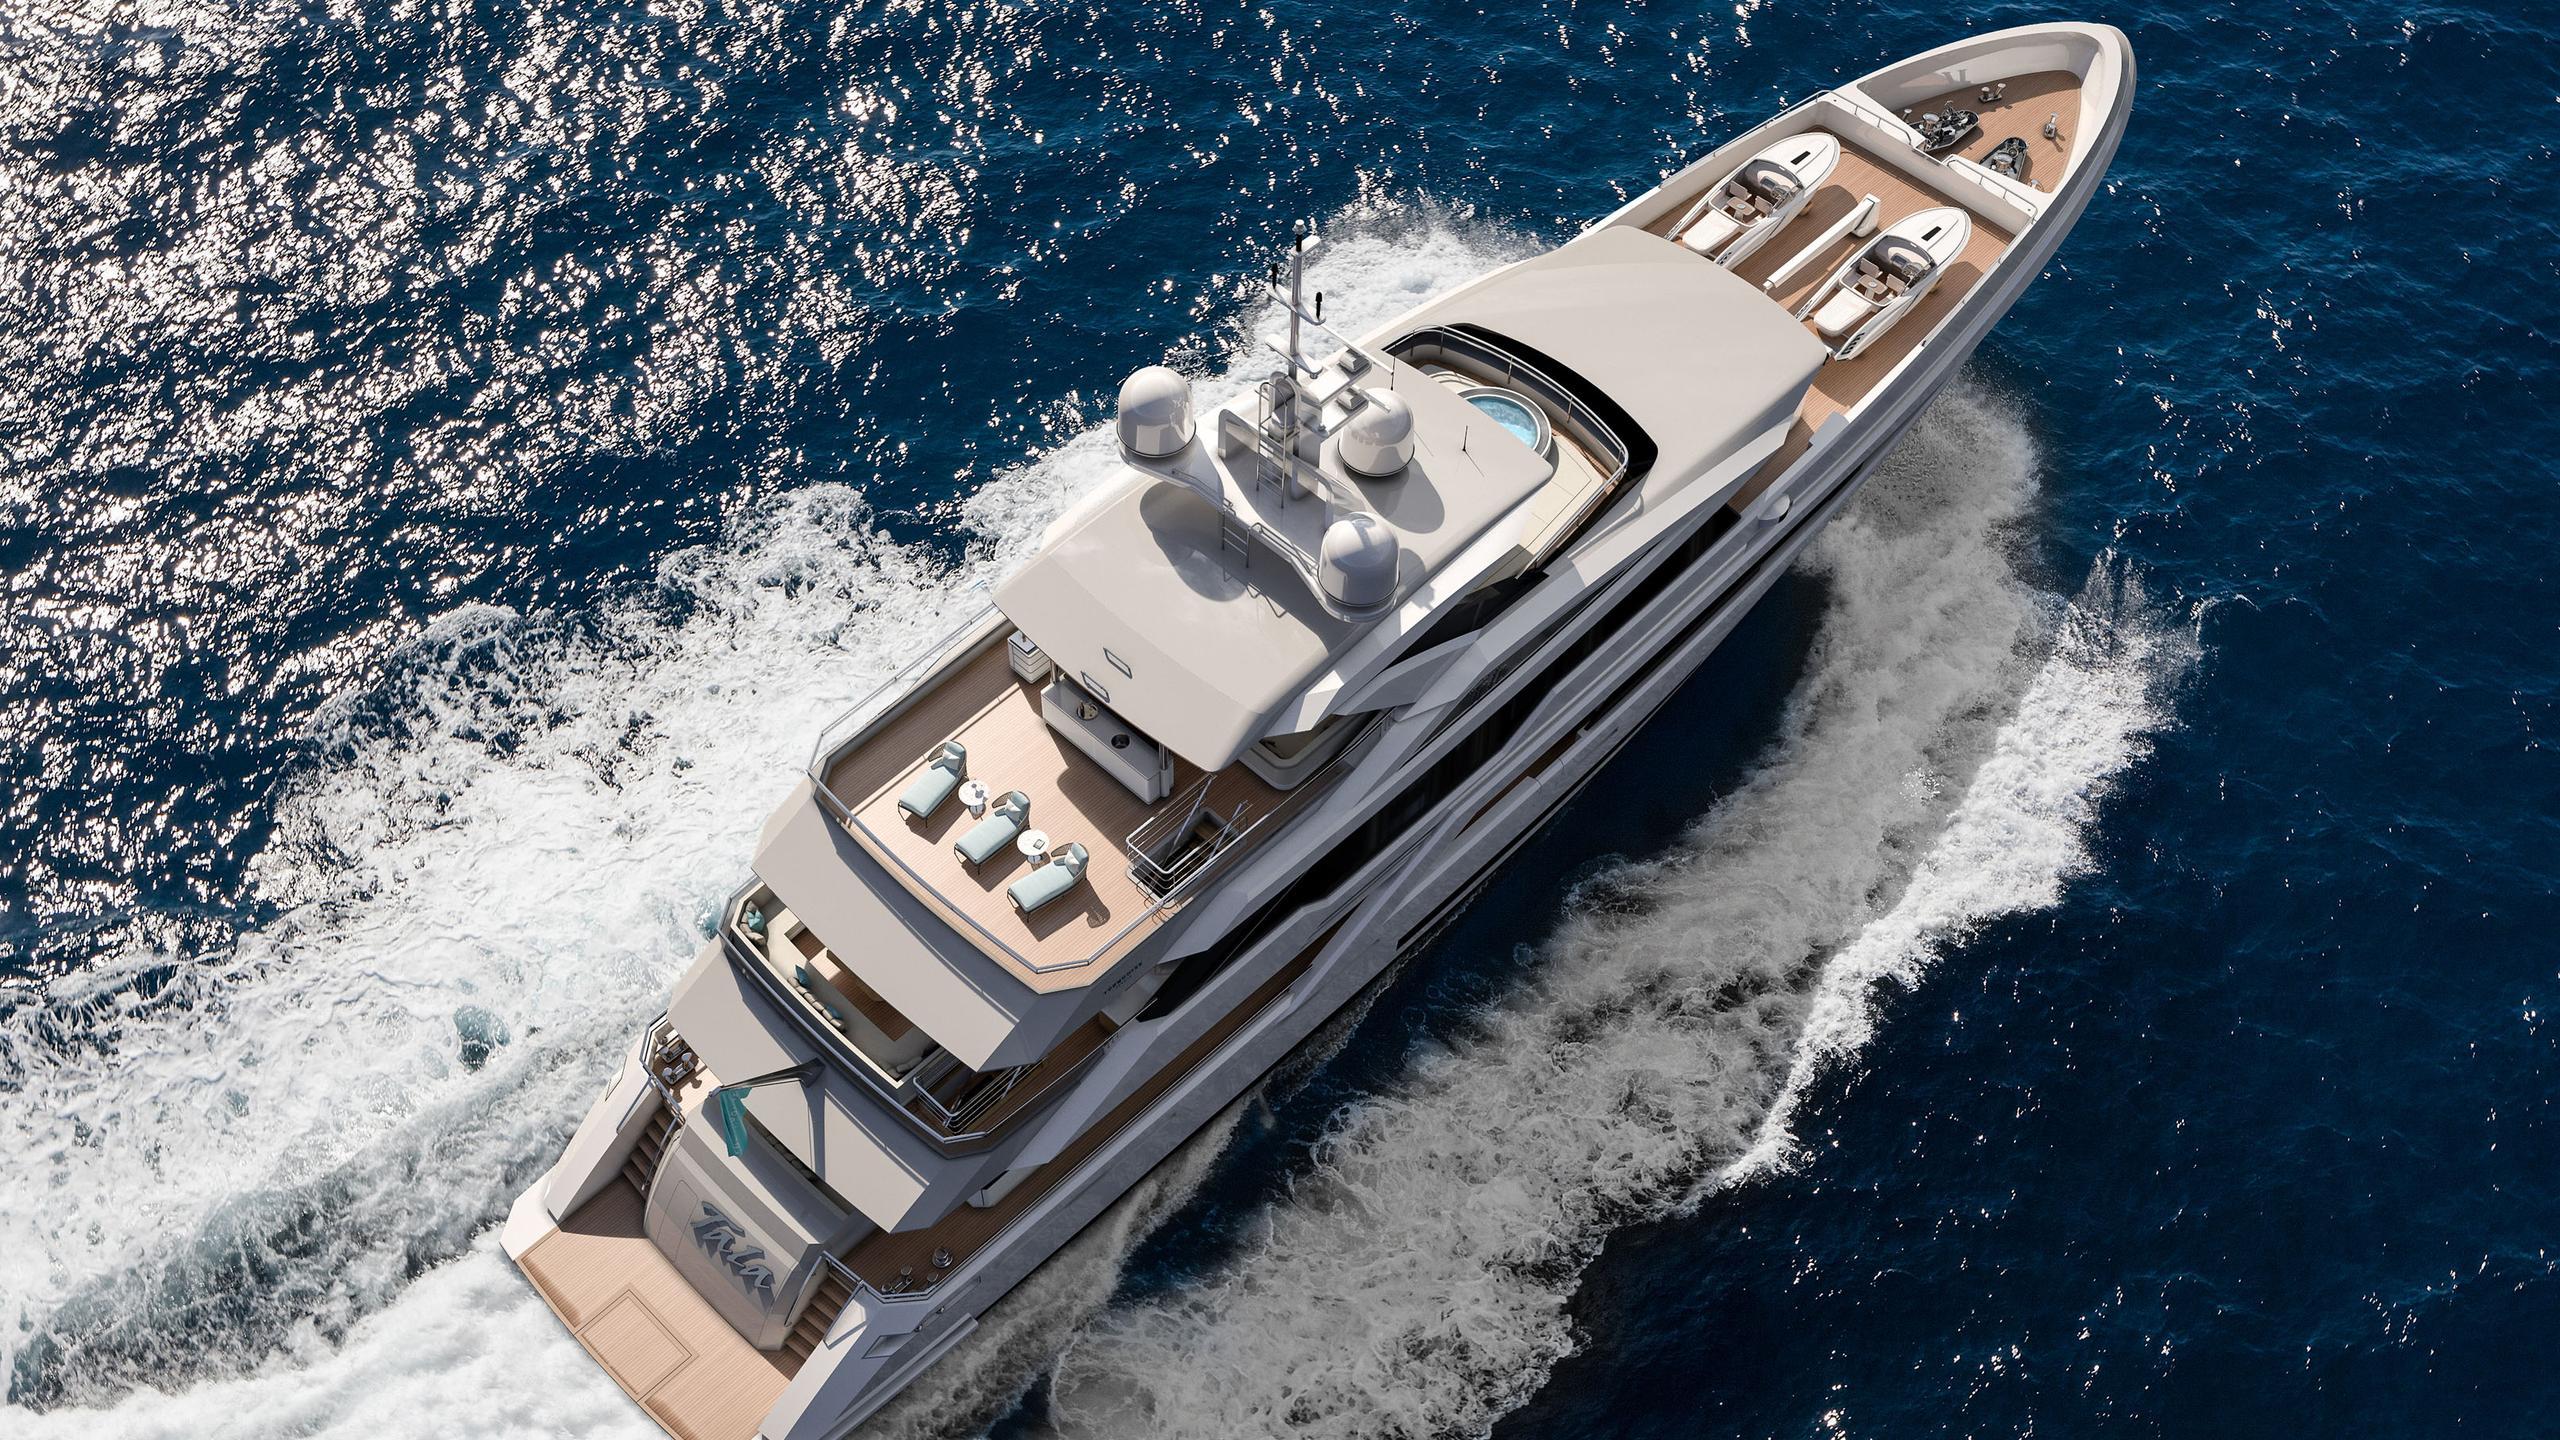 tala motoryacht turquoise yachts 53m 2020 rendering aerial